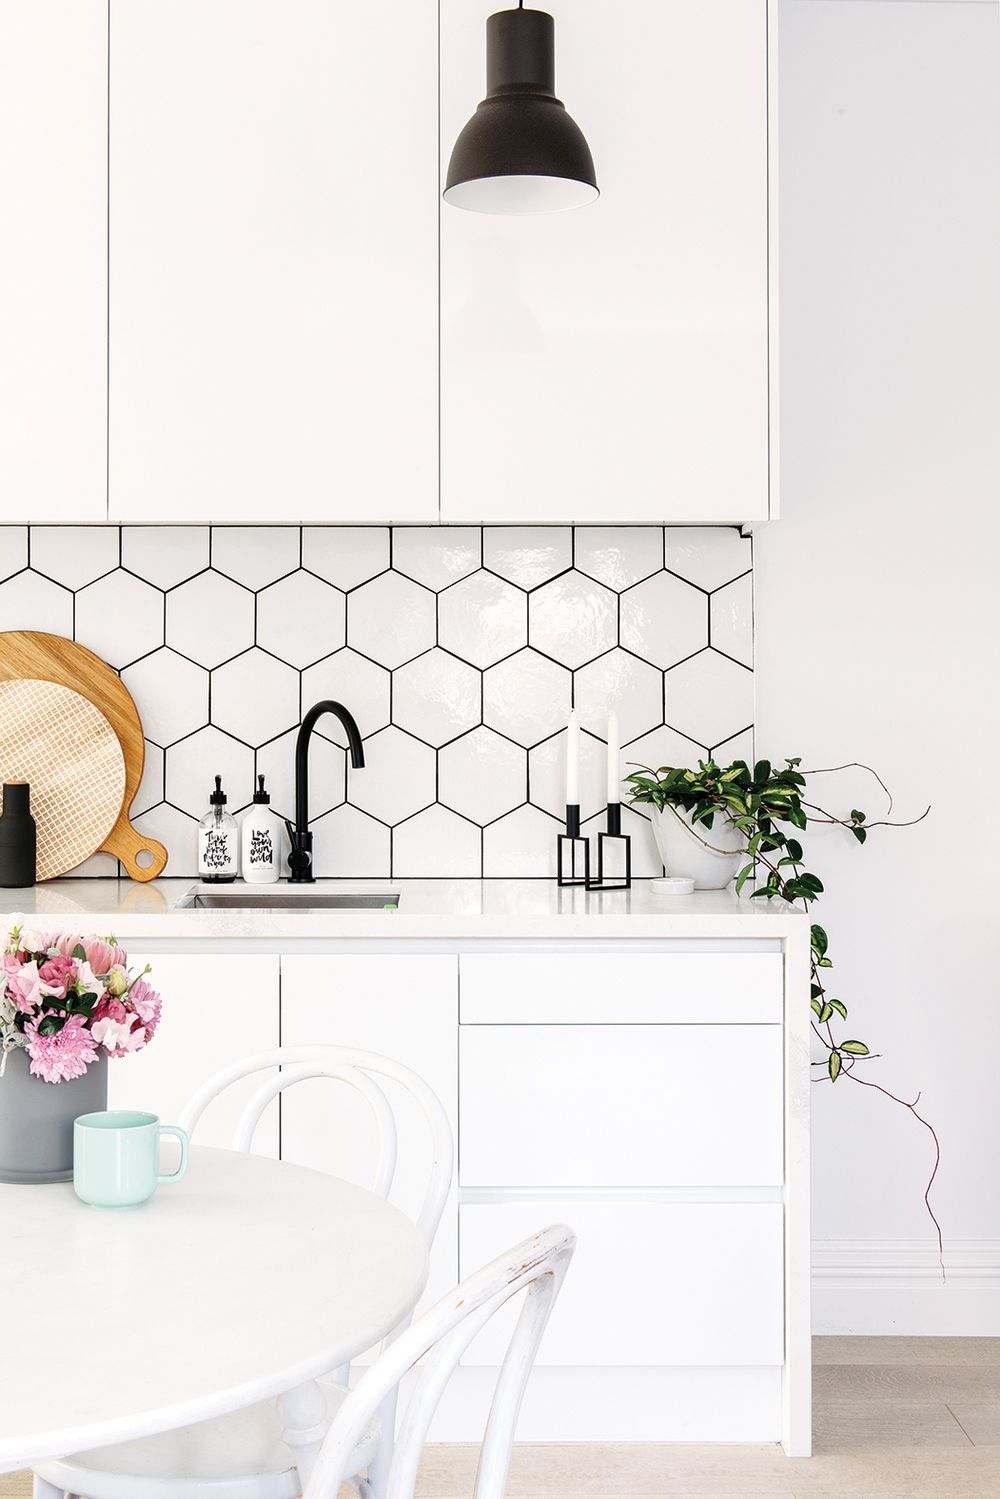 Best 12 Decorative Kitchen Tile Ideas   Cerámica, Baño y Negro